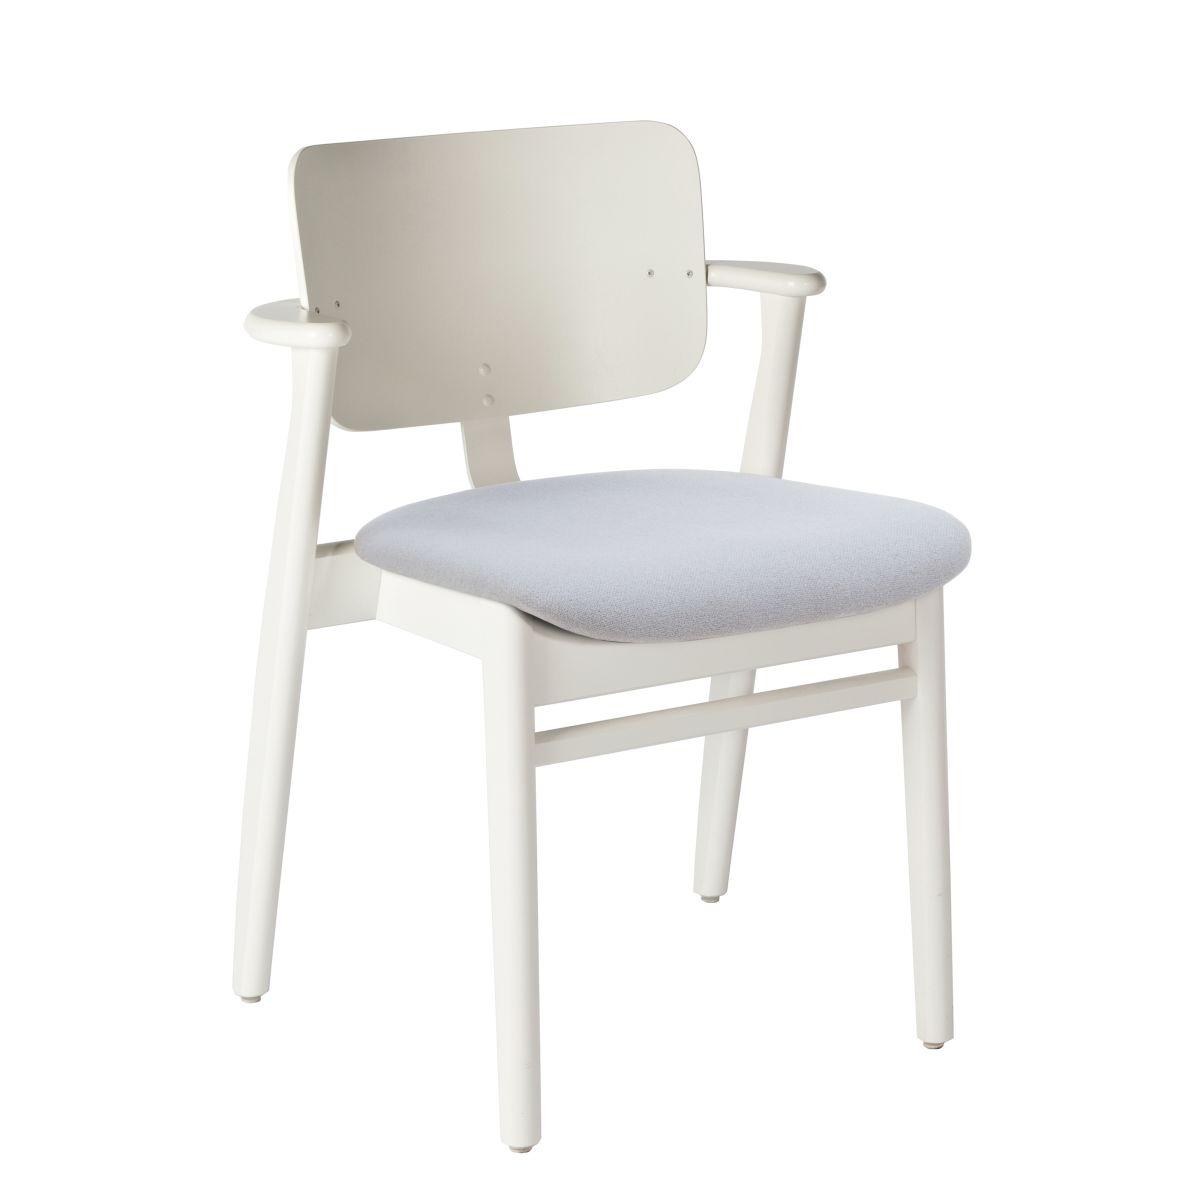 Domus Chair legs white laquered birch_seat fabric grey